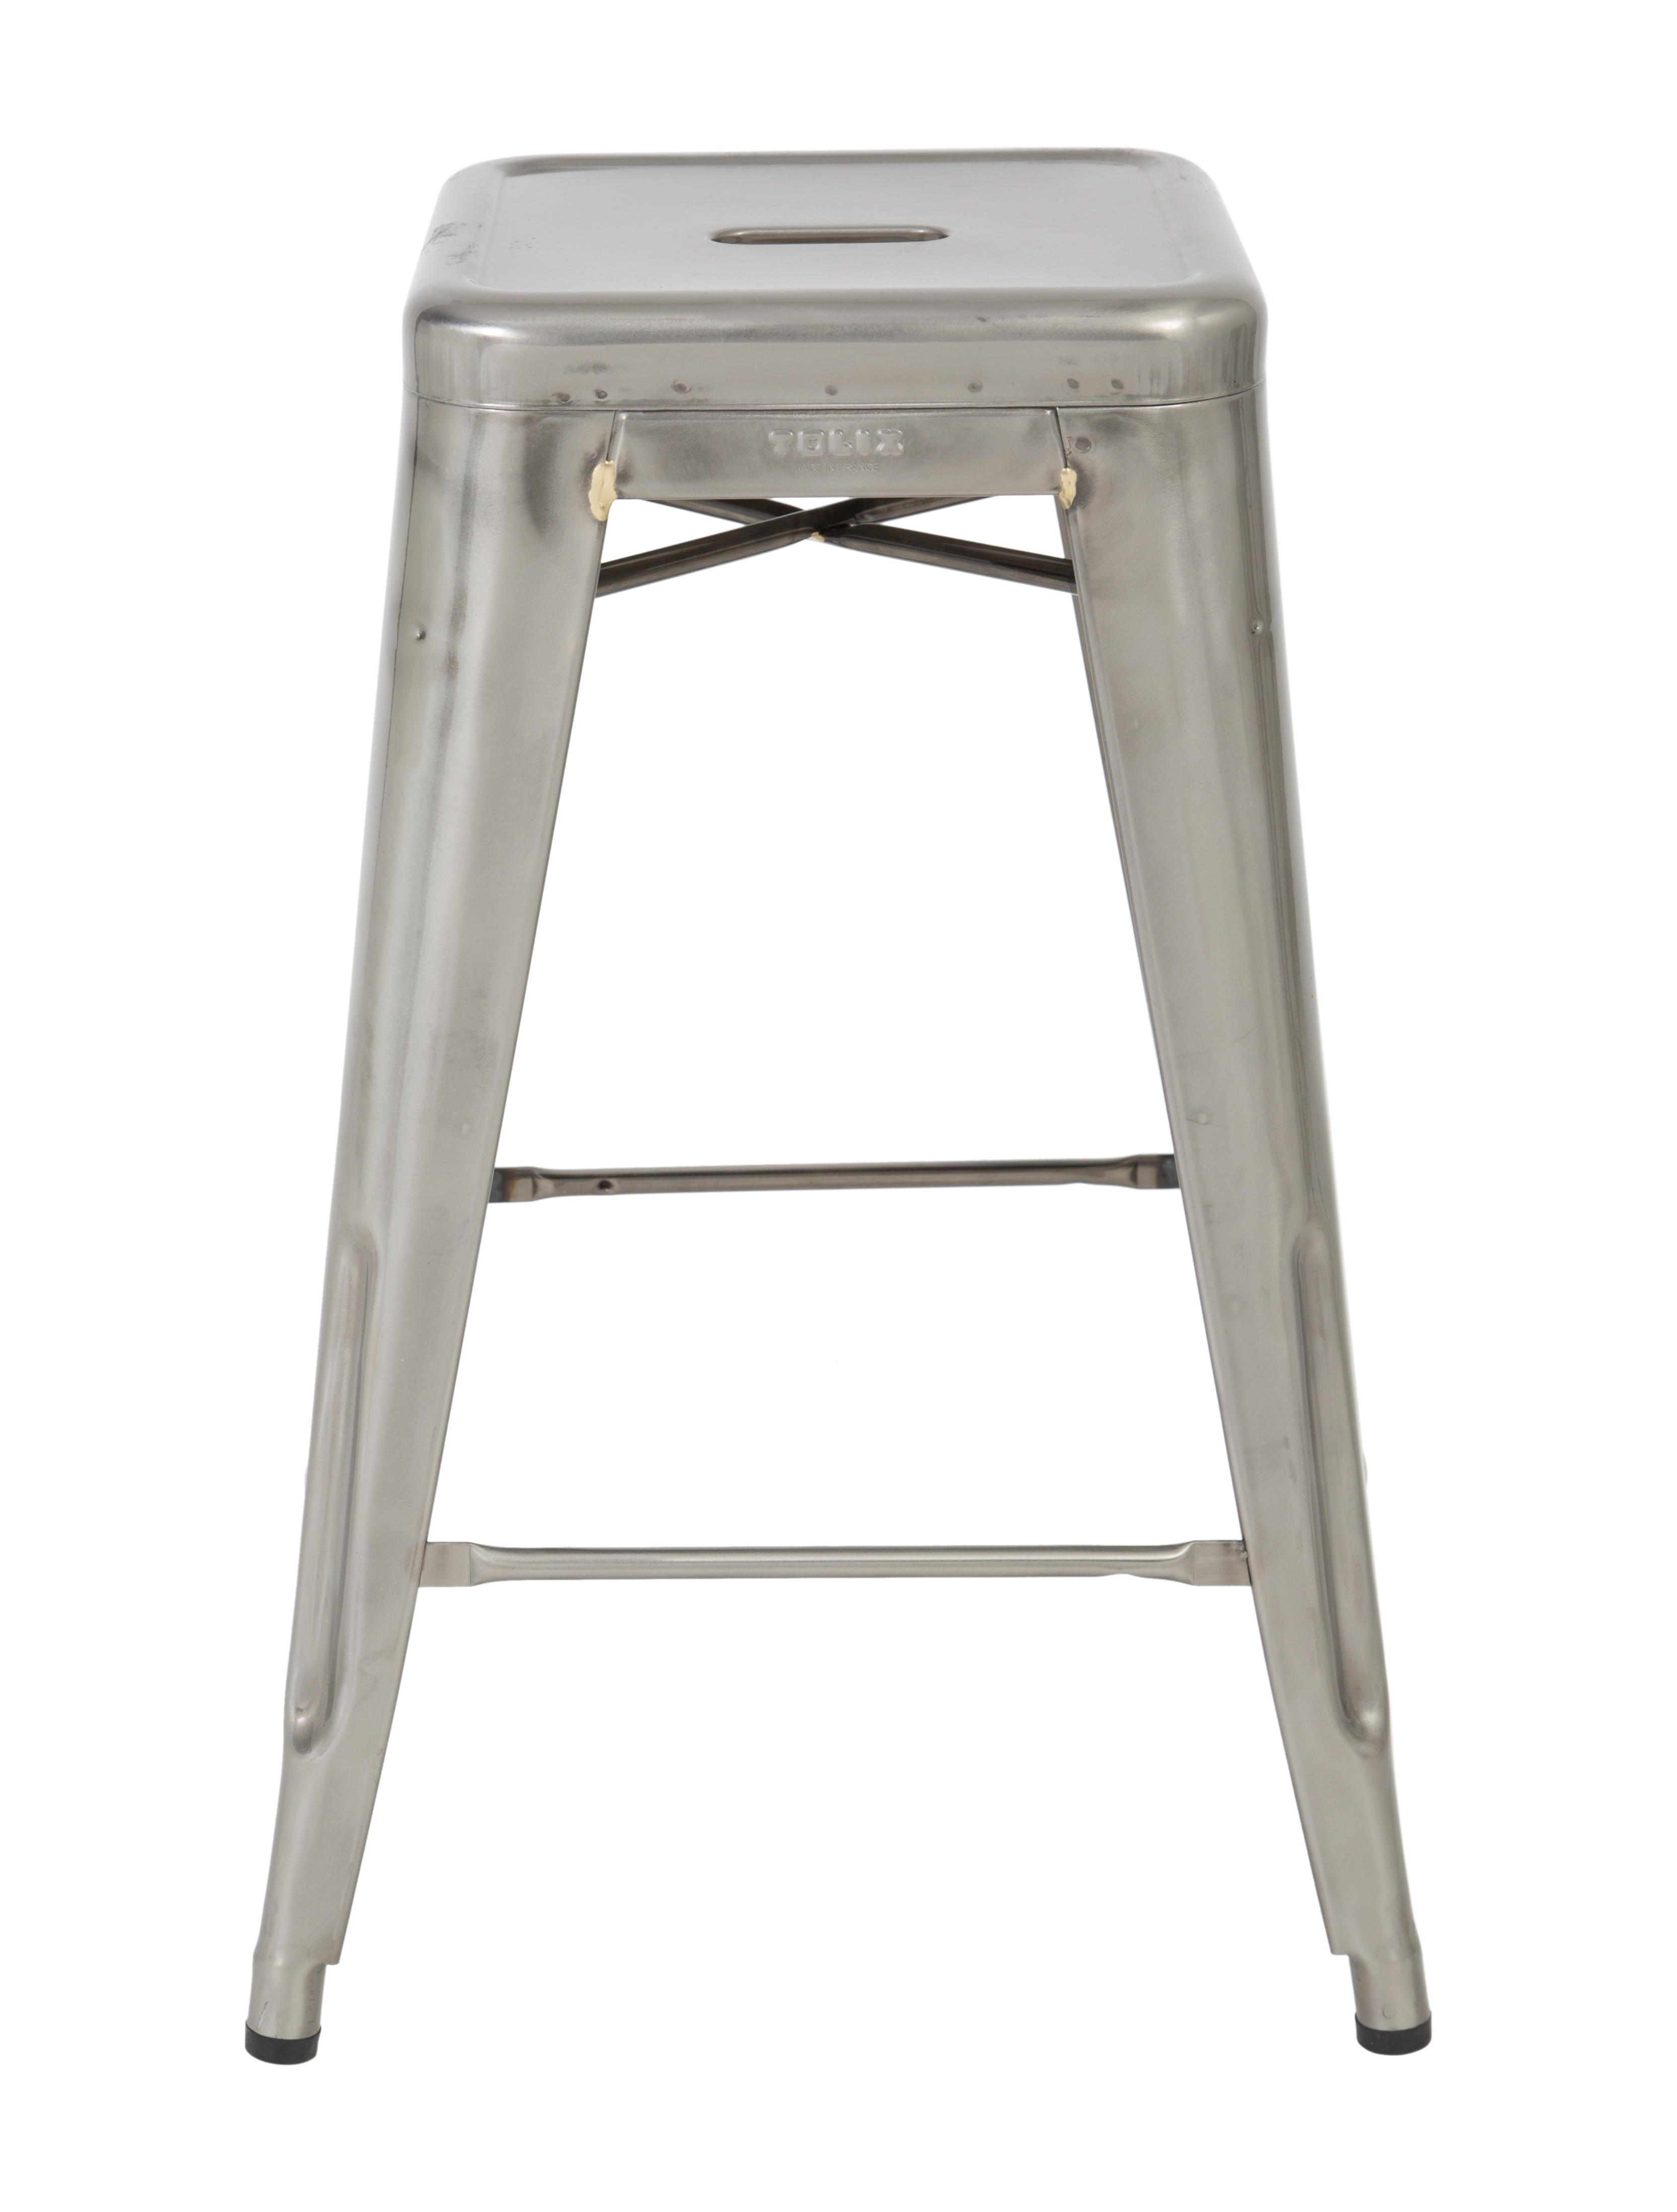 Tolix marais counter stools furniture furni20414 the realreal - Marais counter stool ...